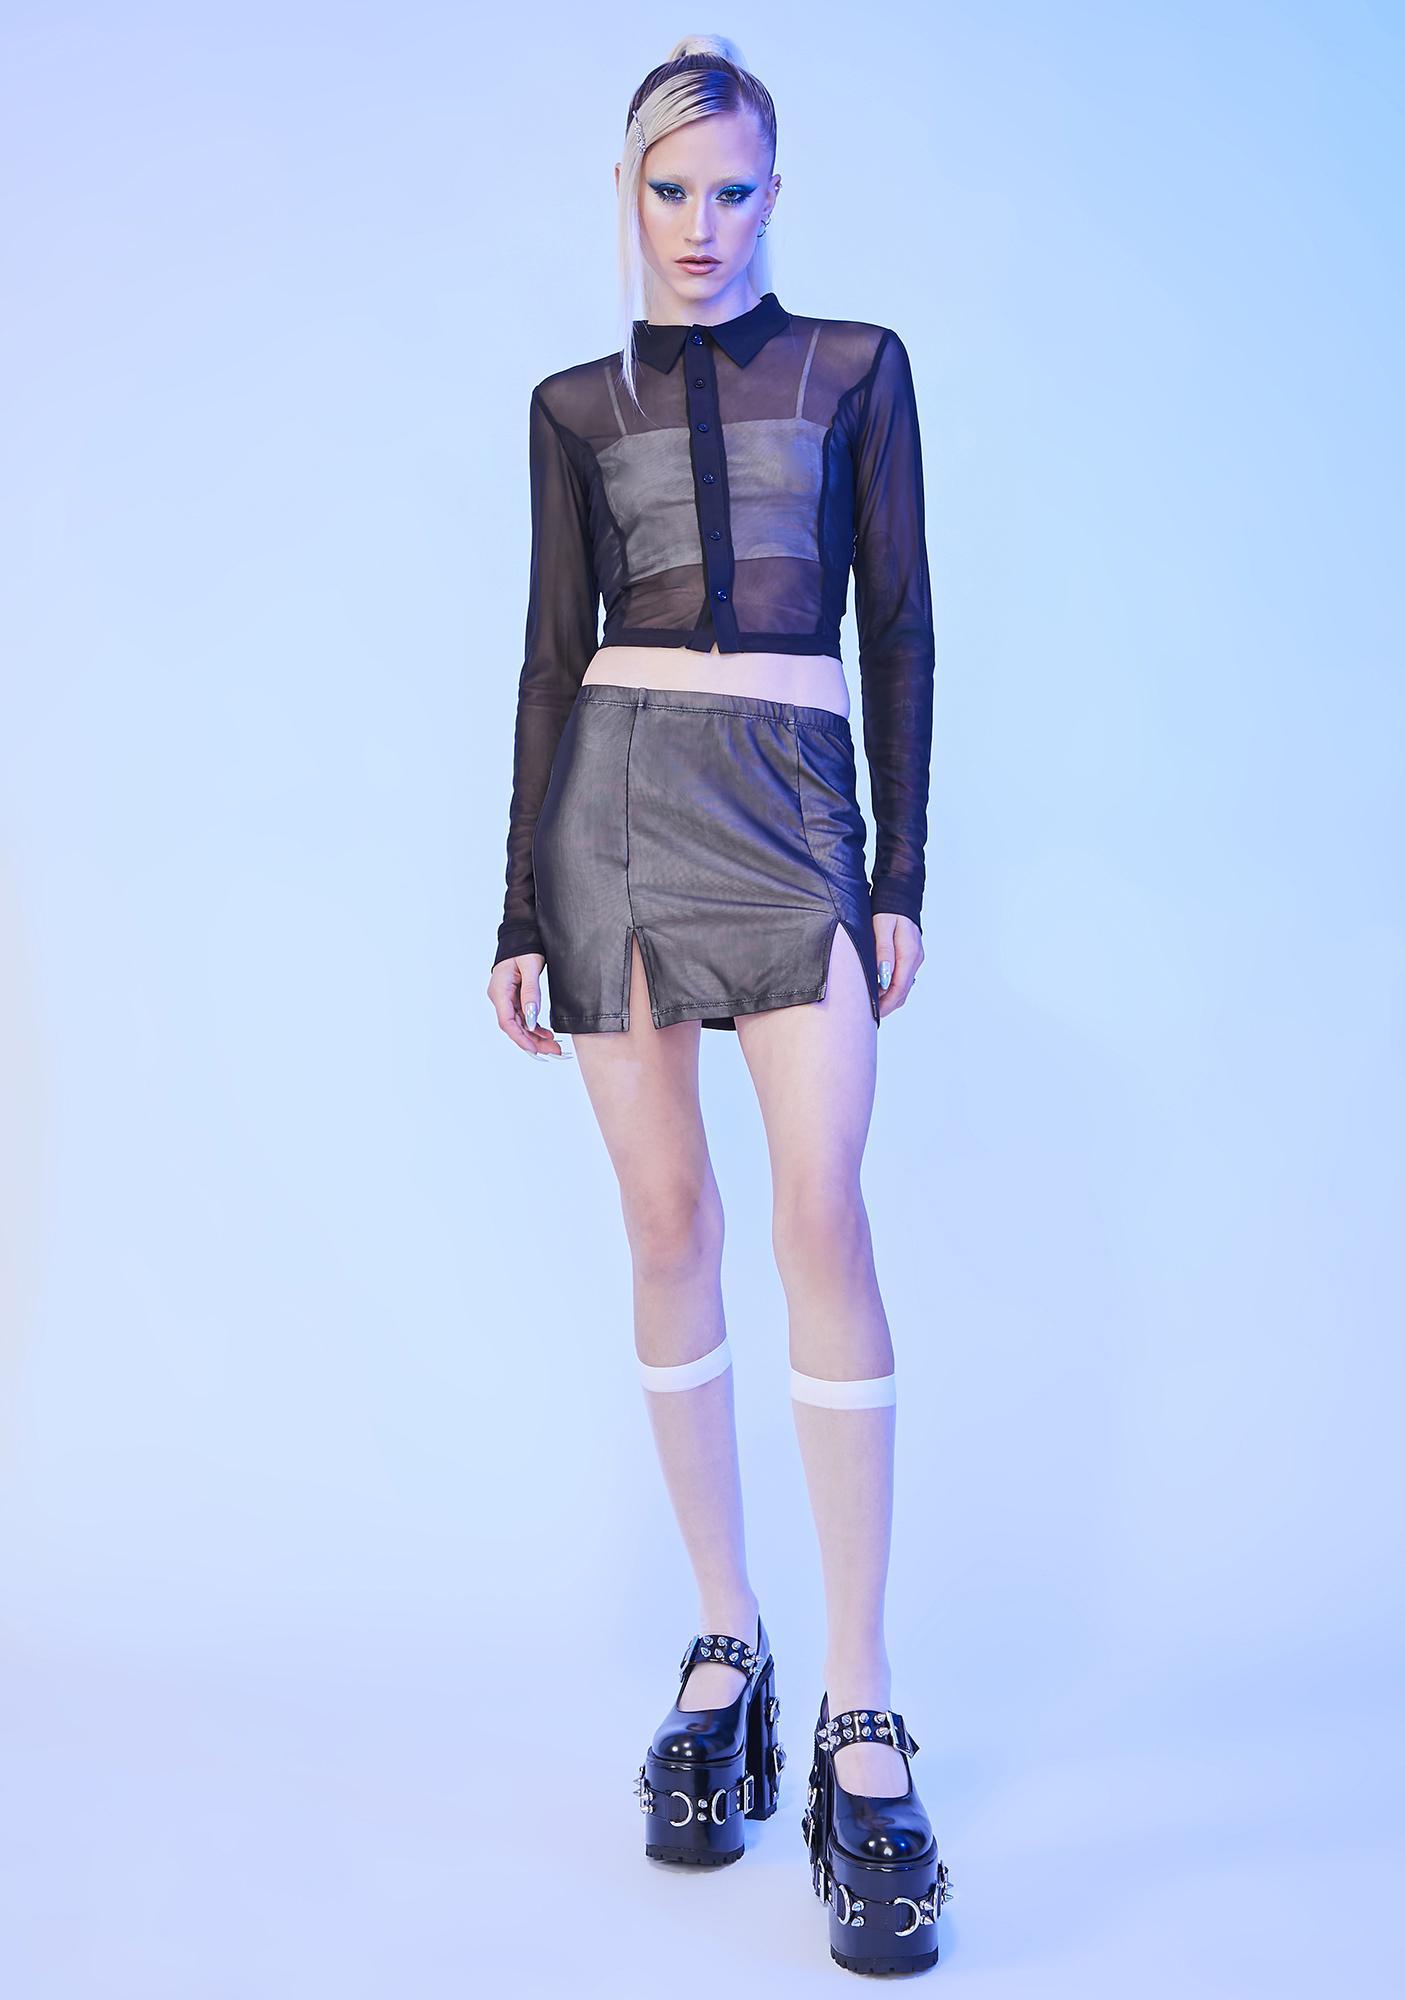 HOROSCOPEZ Night We Met Skirt Set